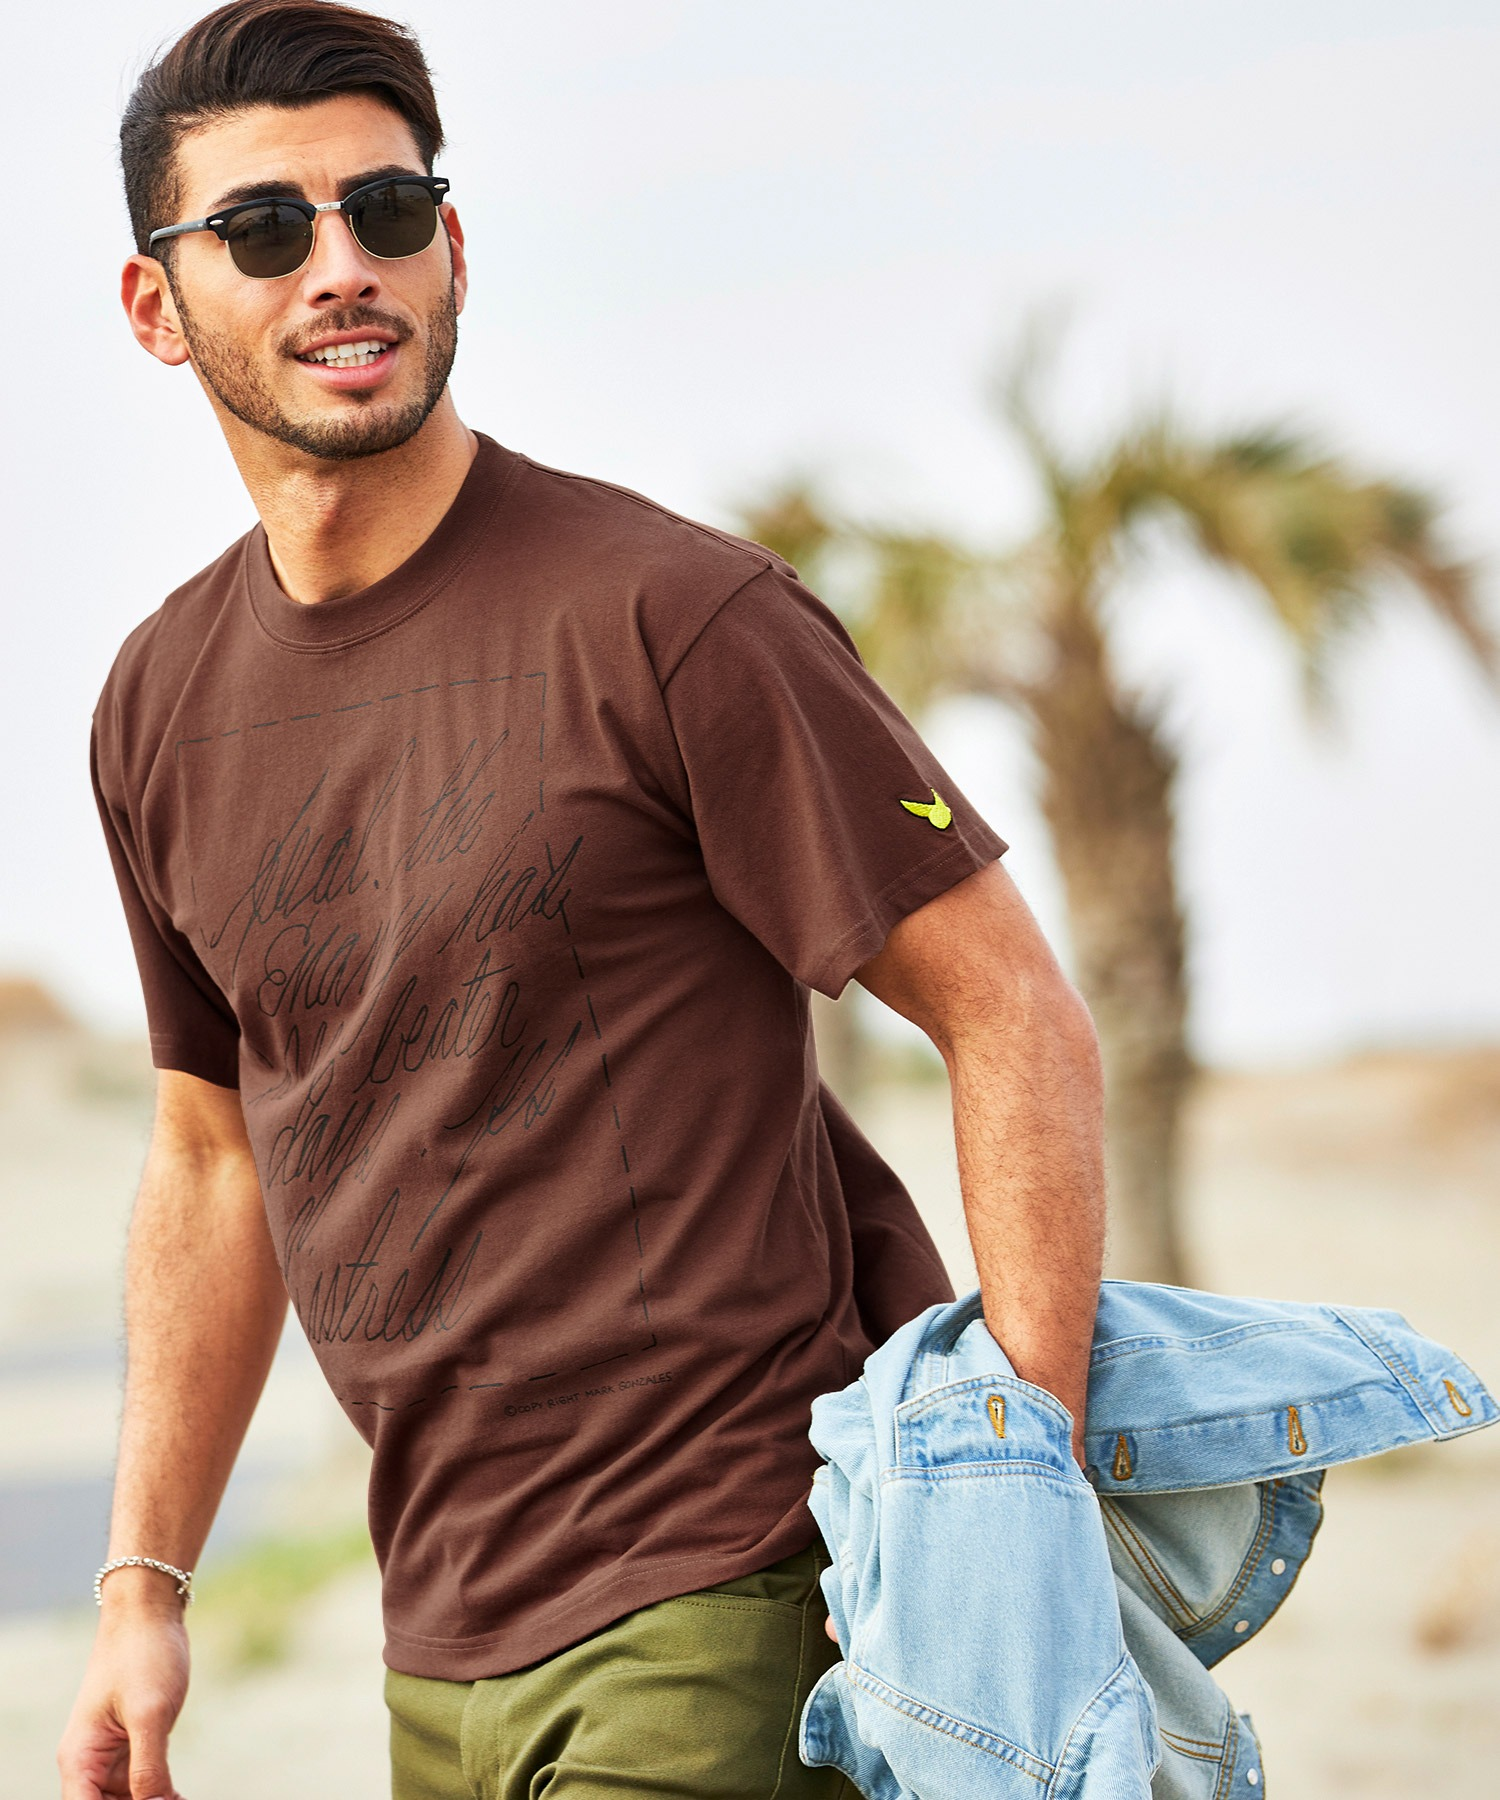 Mark Gonzales/マークゴンザレス 【BARK MANHATTAN別注】 英字プリントオーバーサイズ半袖Tシャツ